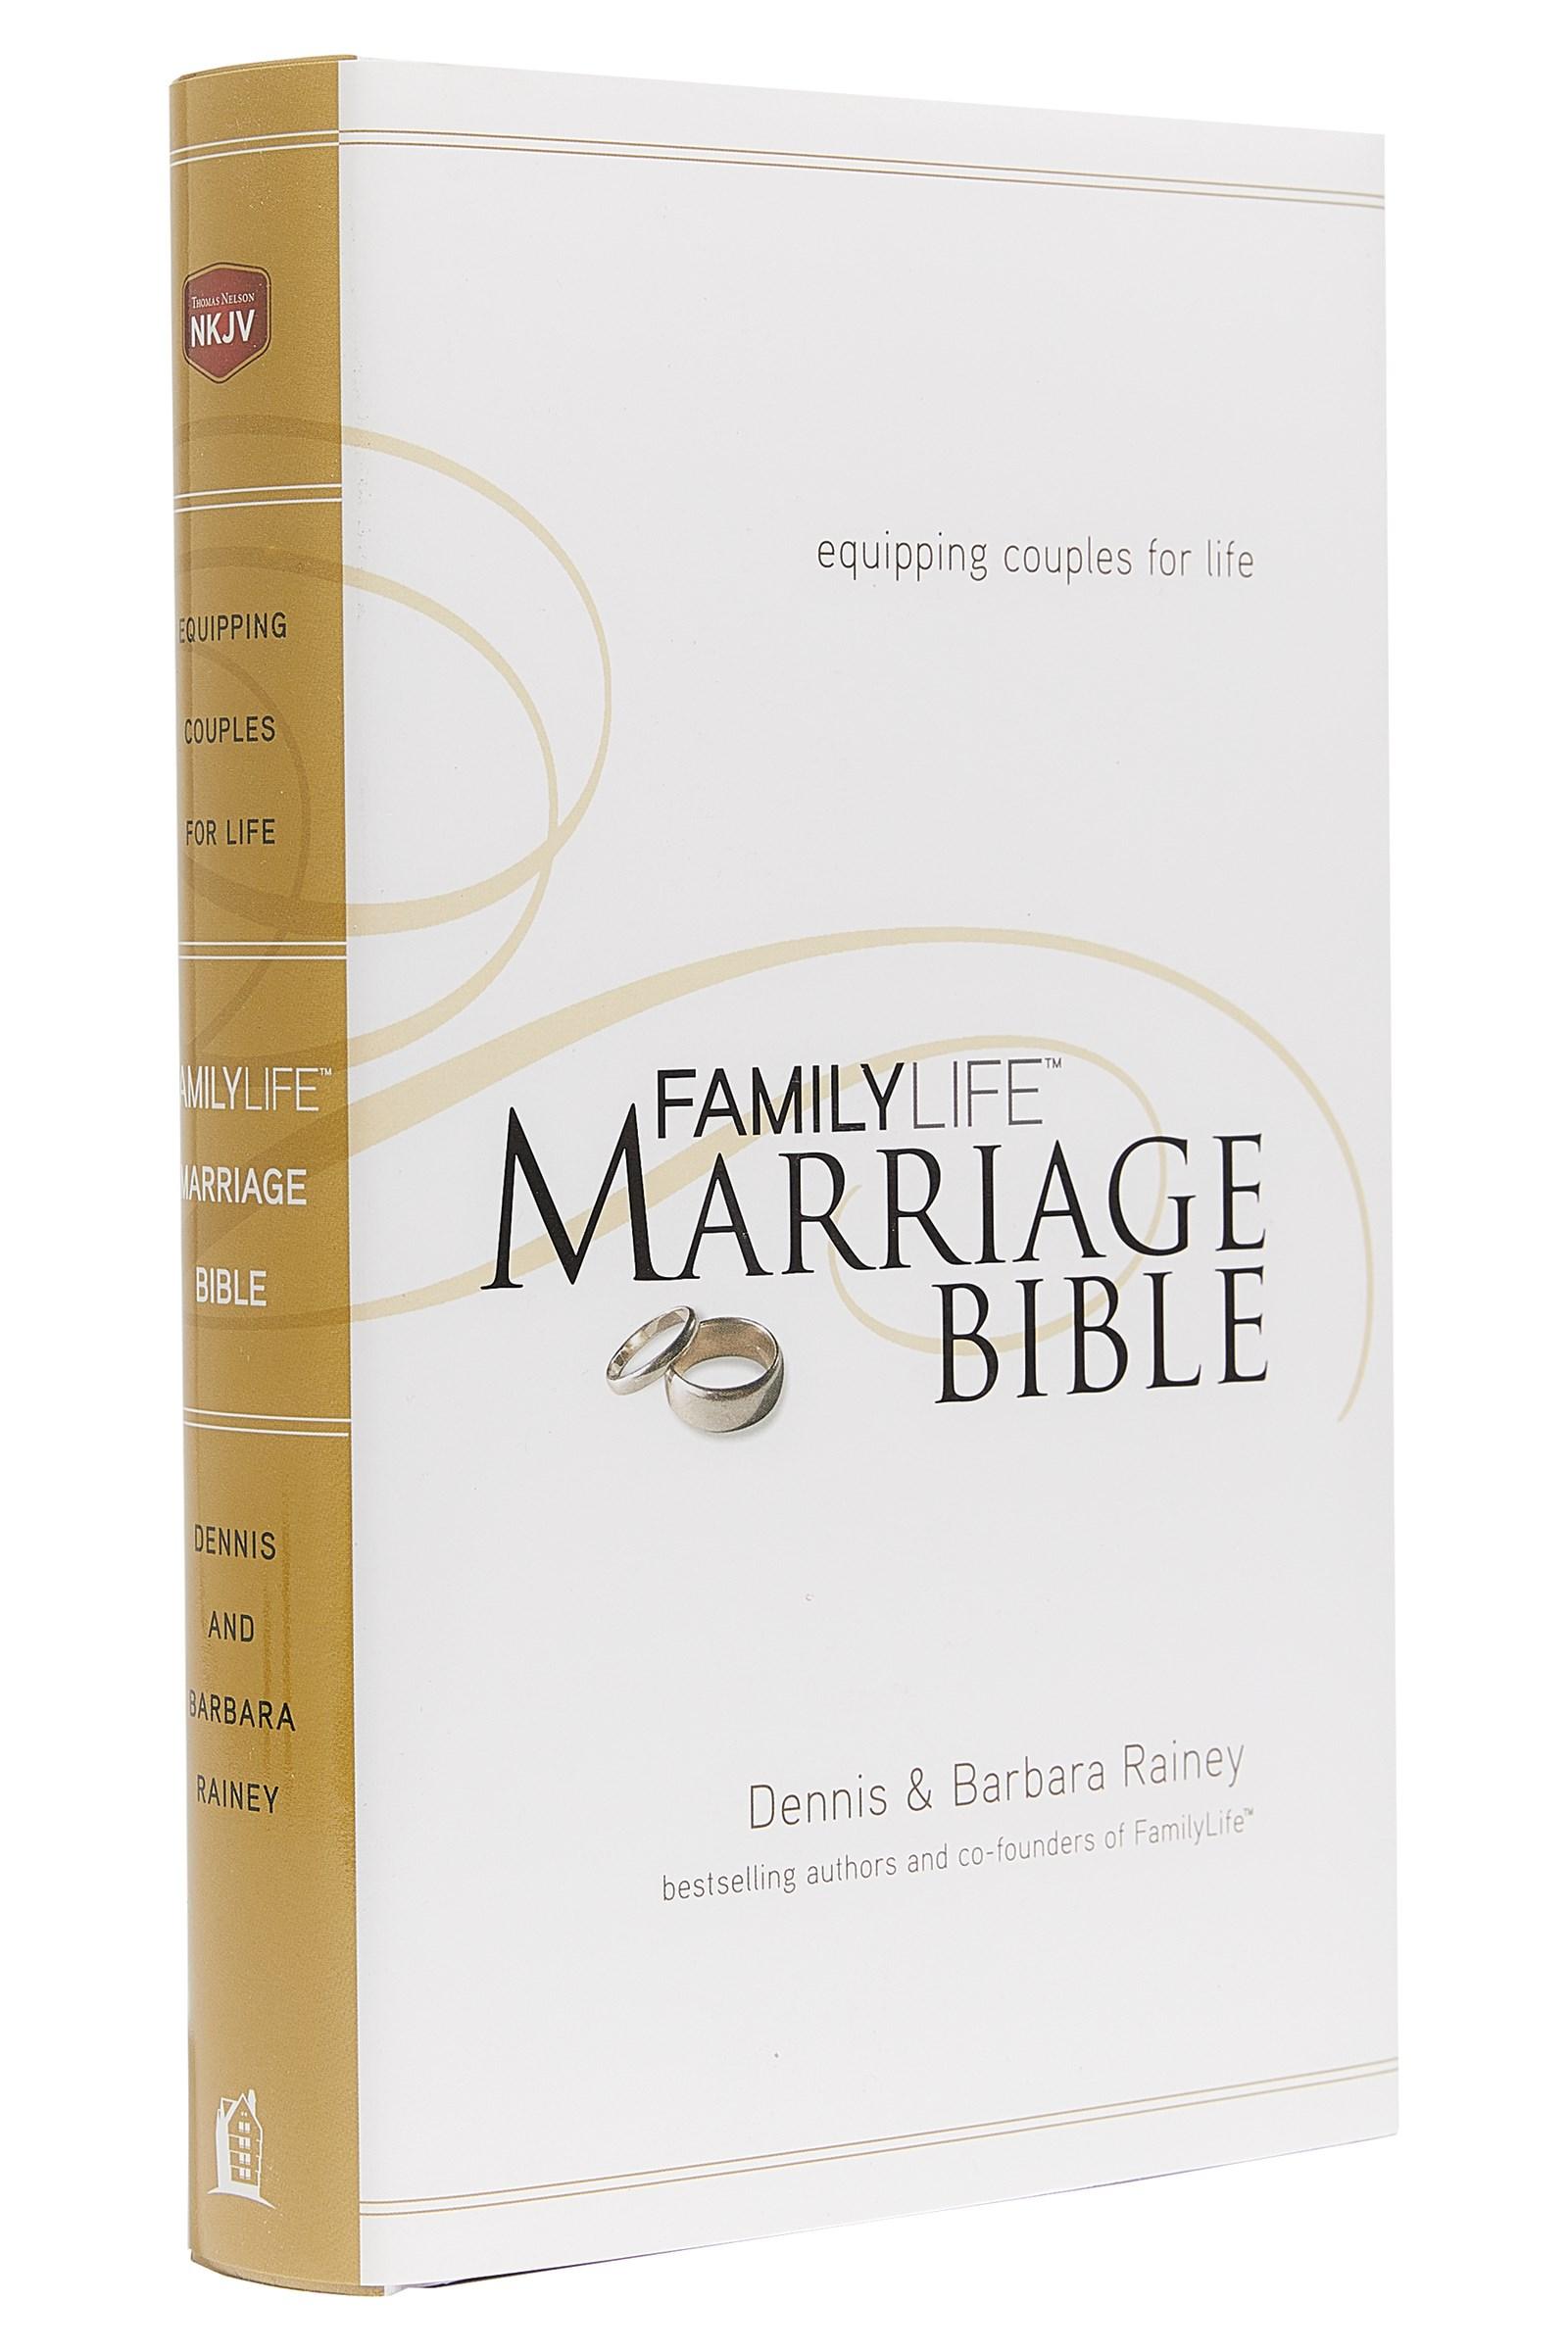 NKJV Familylife Marriage Bible-Hardcover